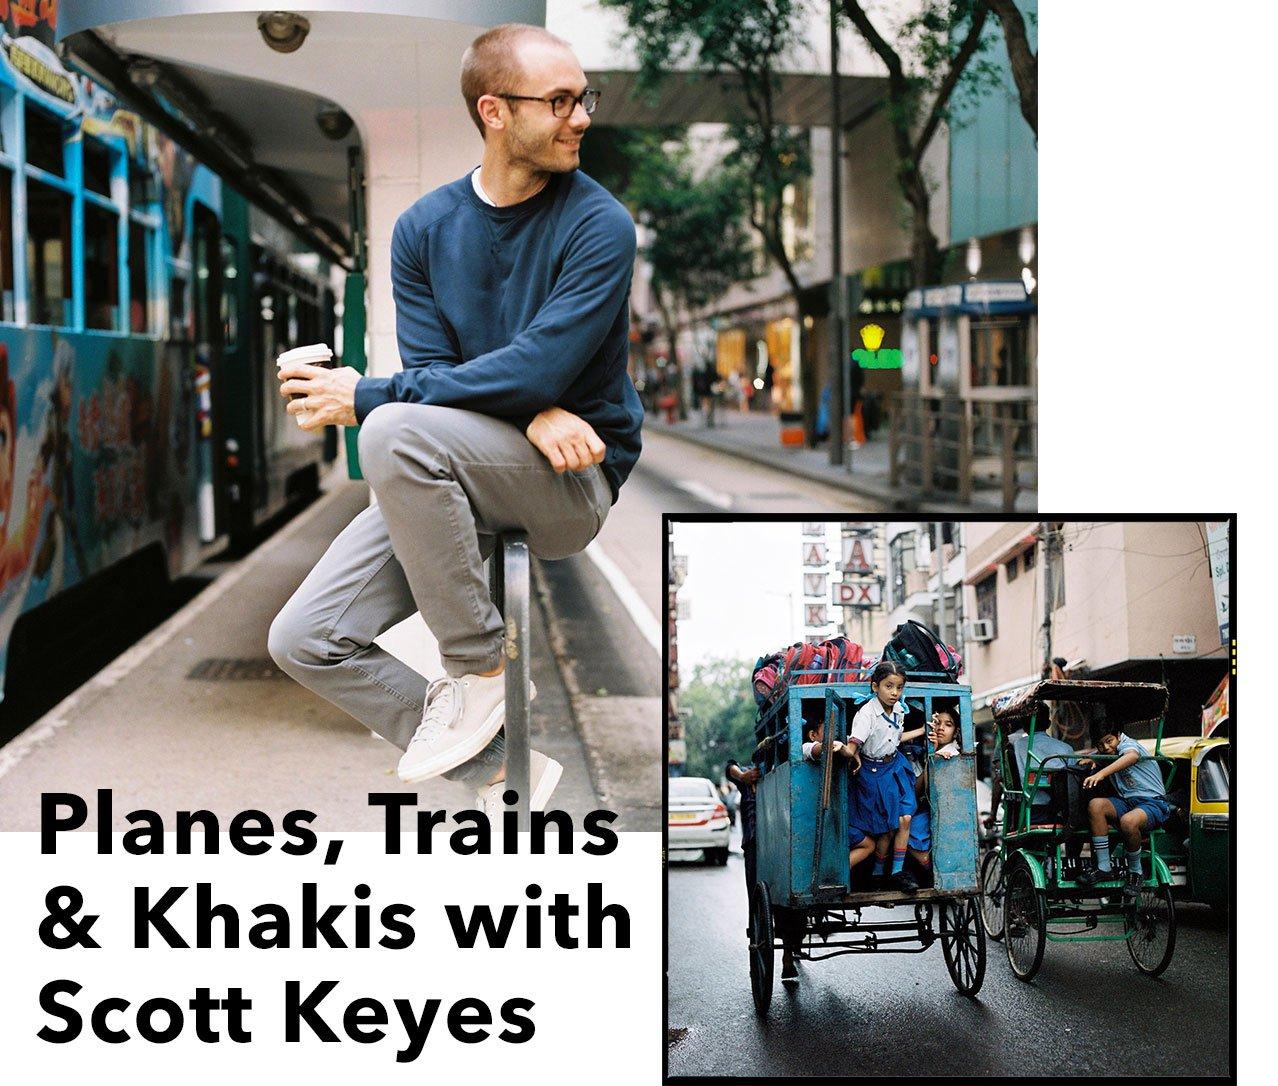 READ WHY SCOTT KEYES LOVES HIS DOCKERS